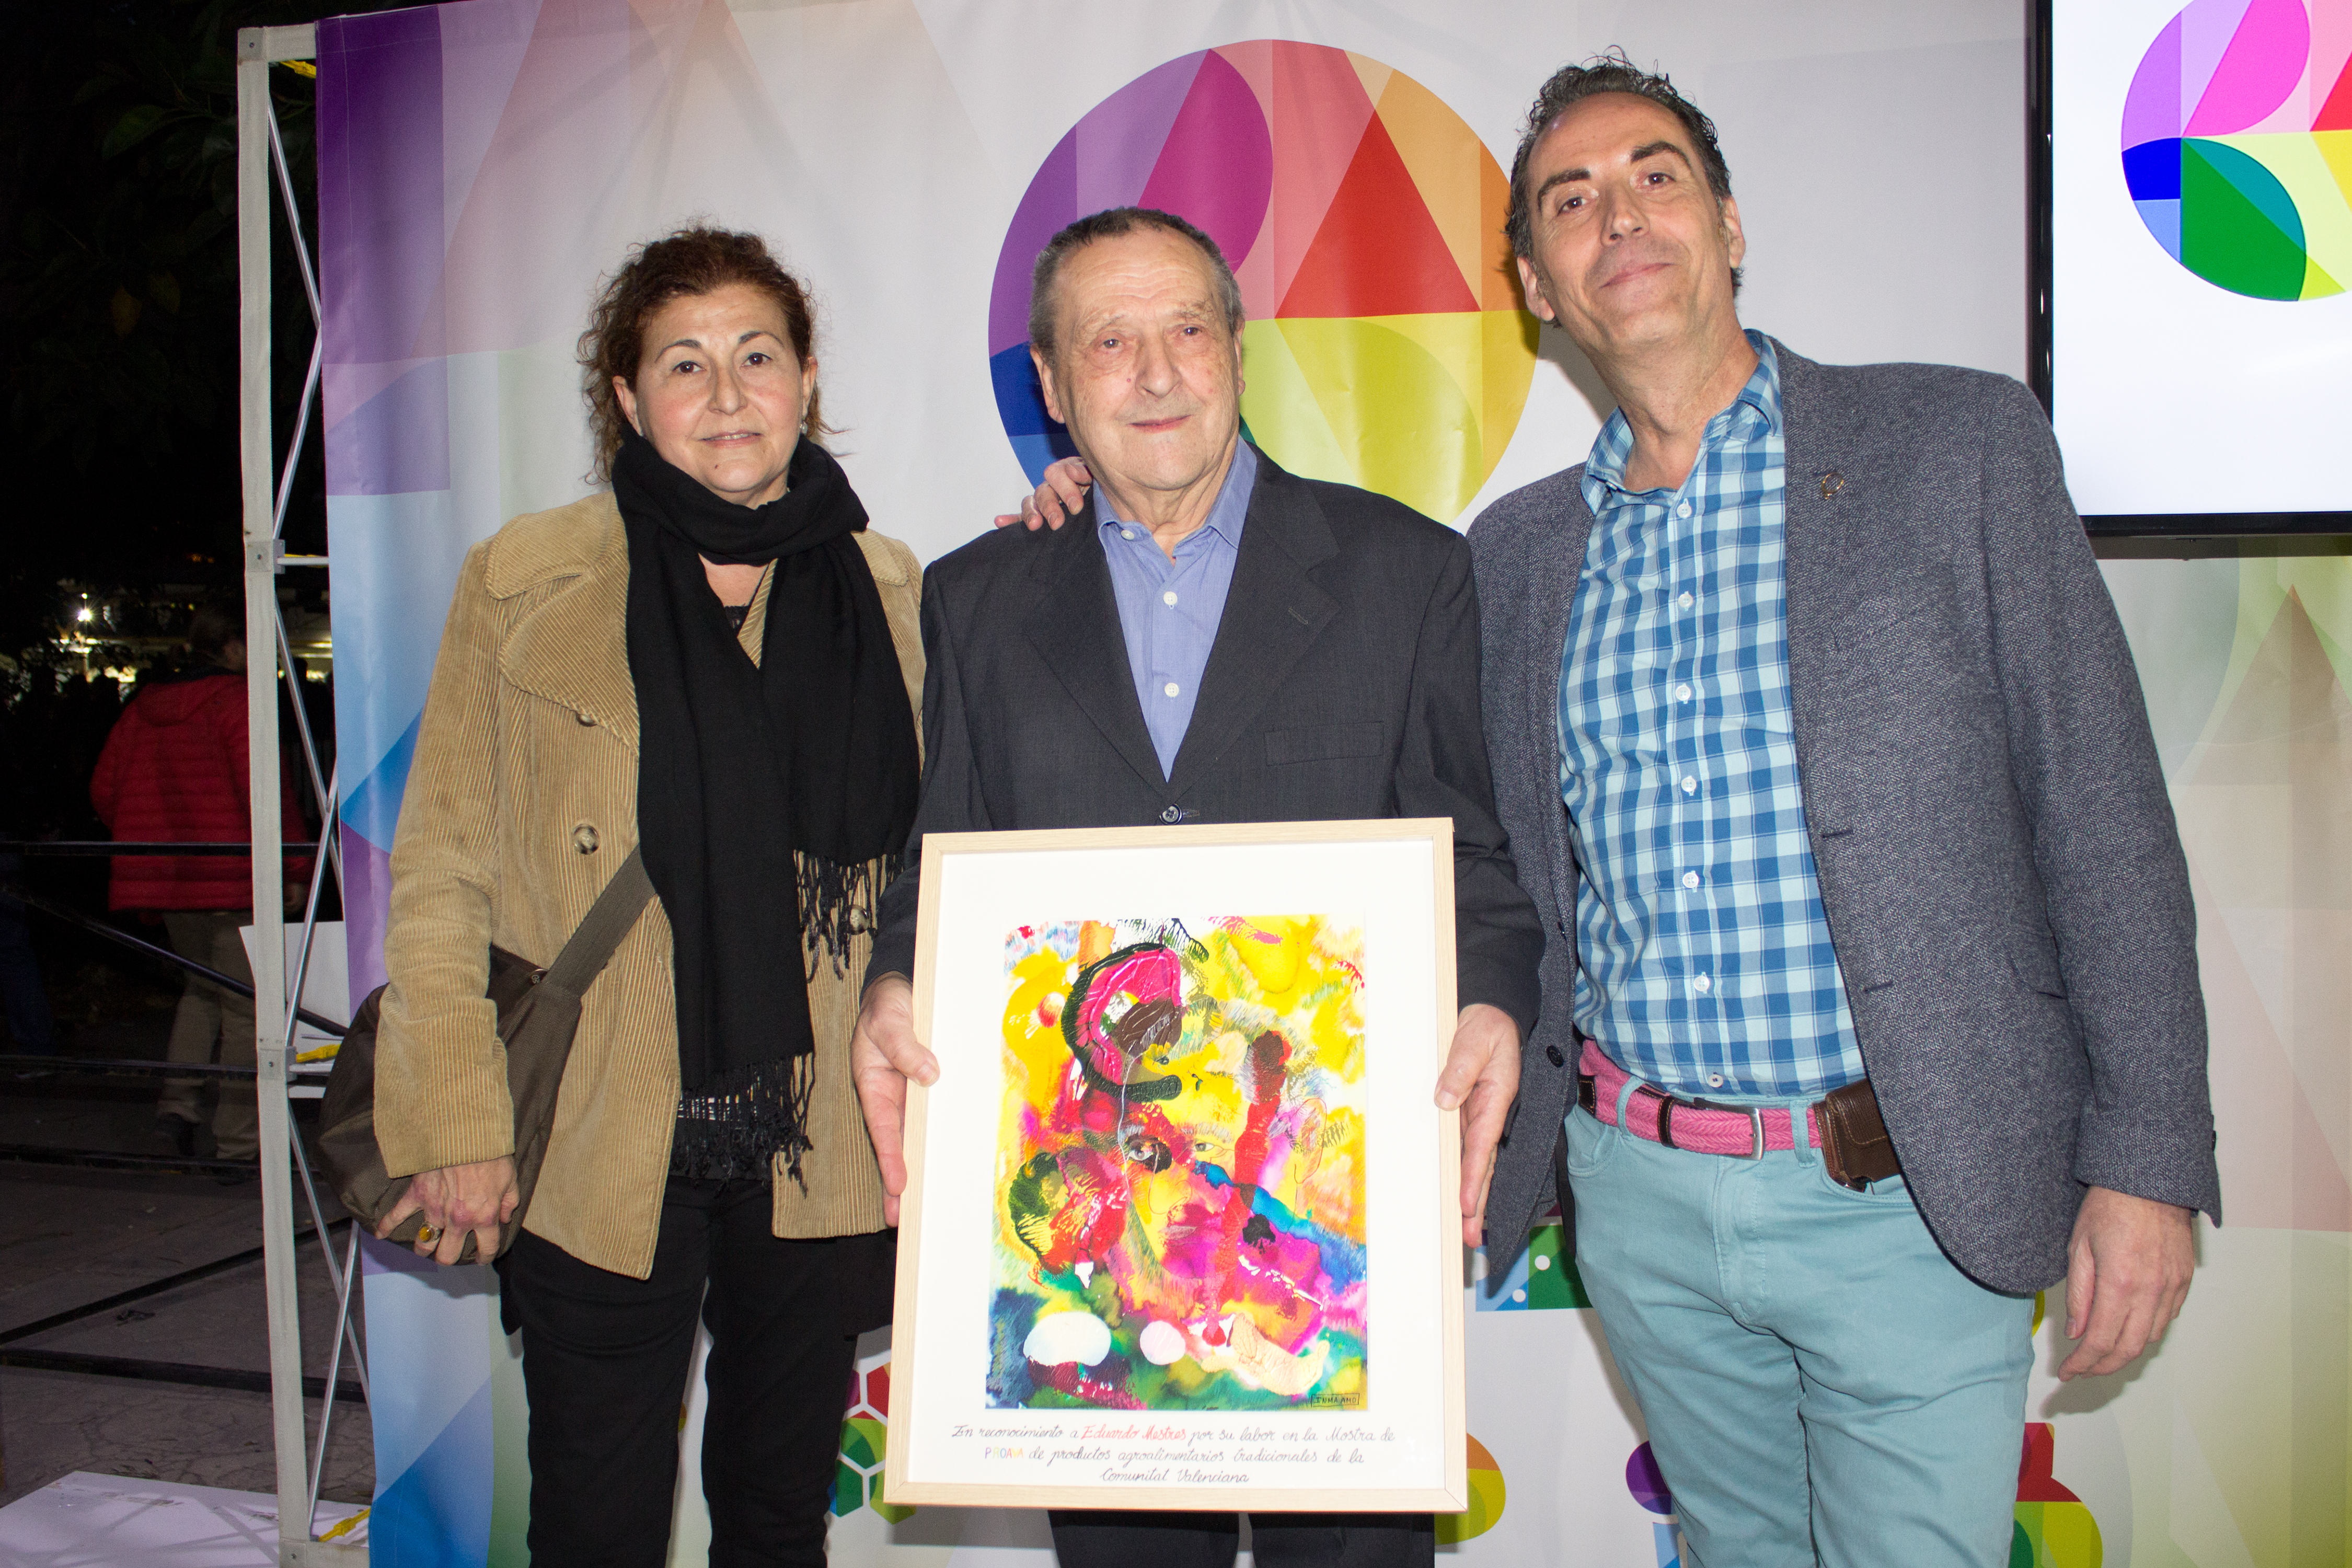 Homenaje Proava a Eduardo Mestres con una obra de Inma Amo